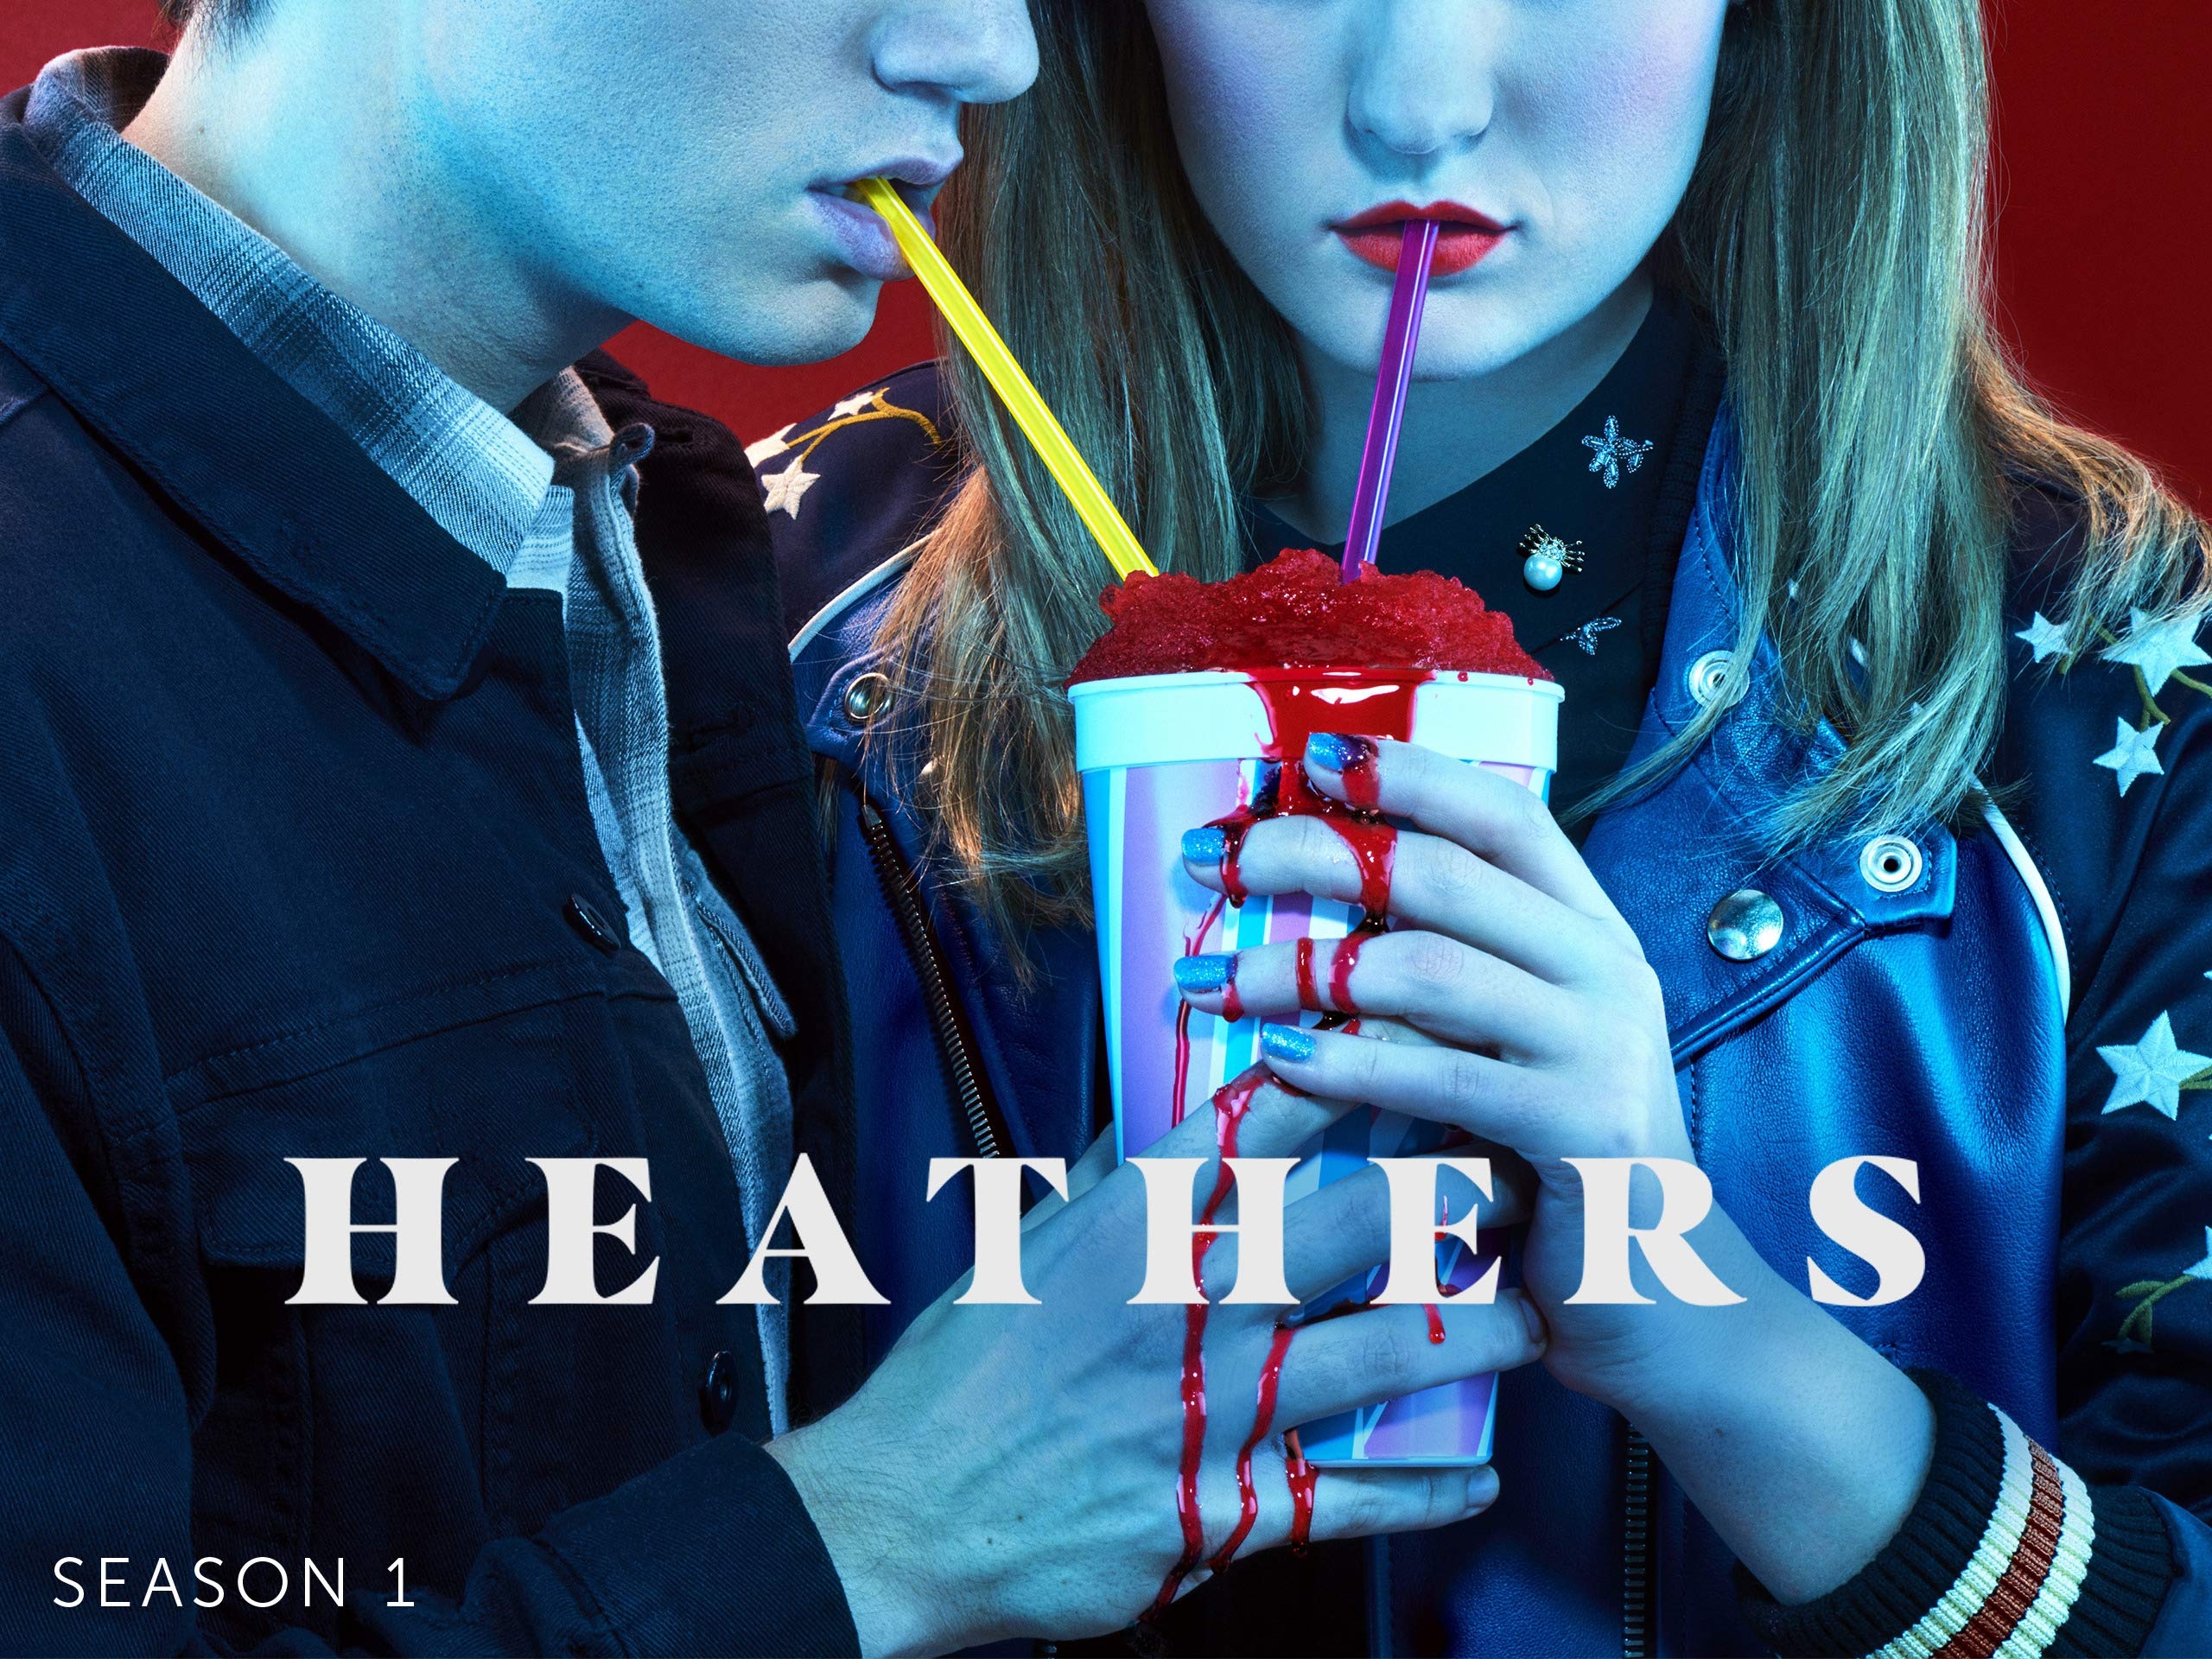 Amazon co uk: Watch Heathers - Season 1 | Prime Video